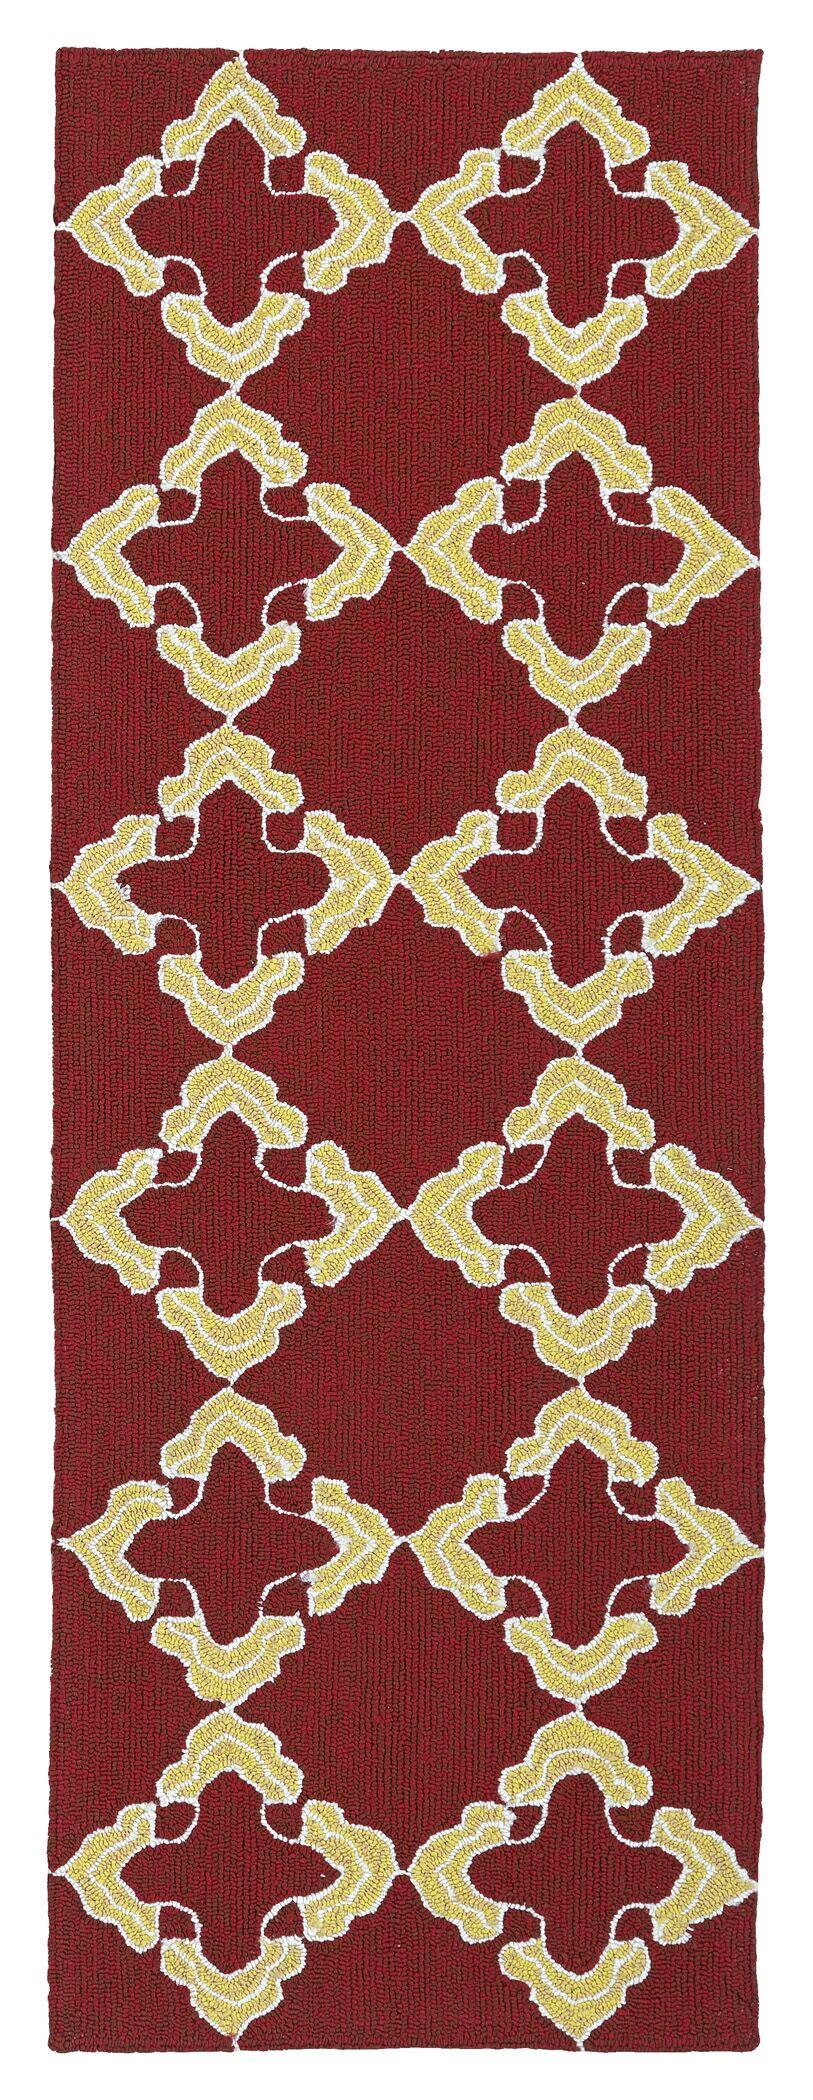 Cowan Red/Yellow Indoor/Outdoor Area Rug Rug Size: Rectangle 9' x 12'